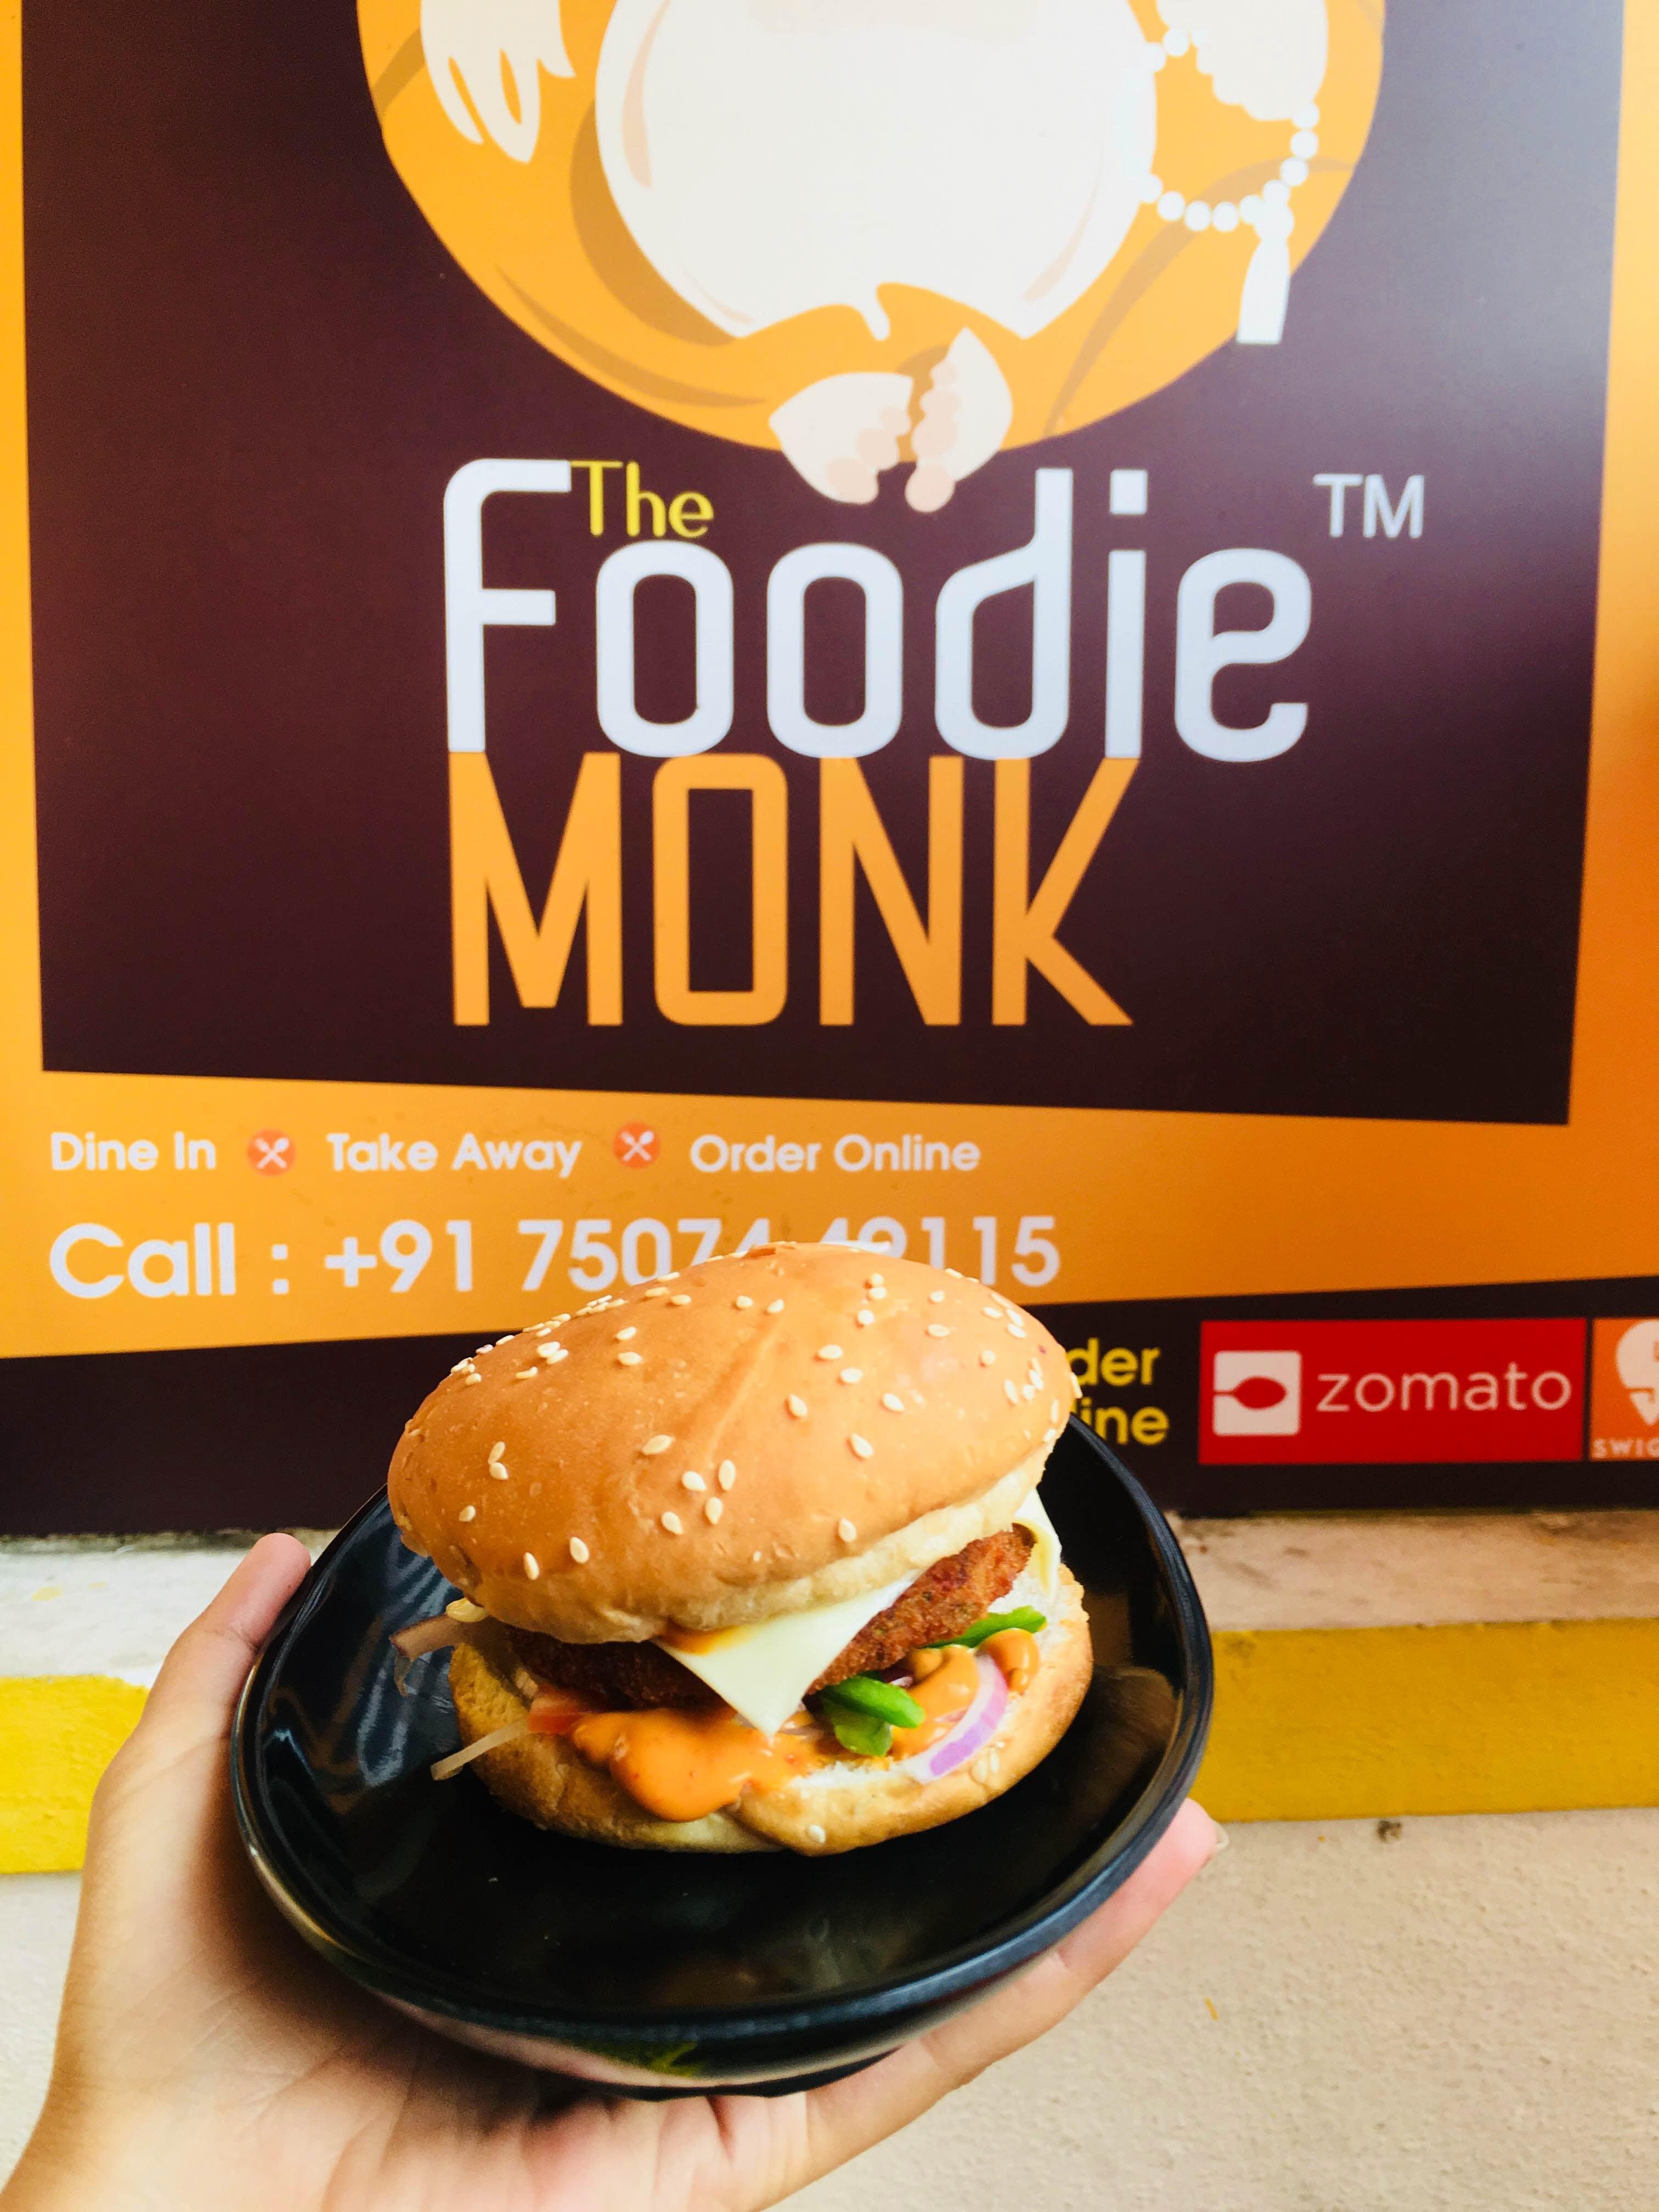 Dish,Food,Junk food,Hamburger,Fast food,Cuisine,Original chicken sandwich,Whopper,Ingredient,Cheeseburger